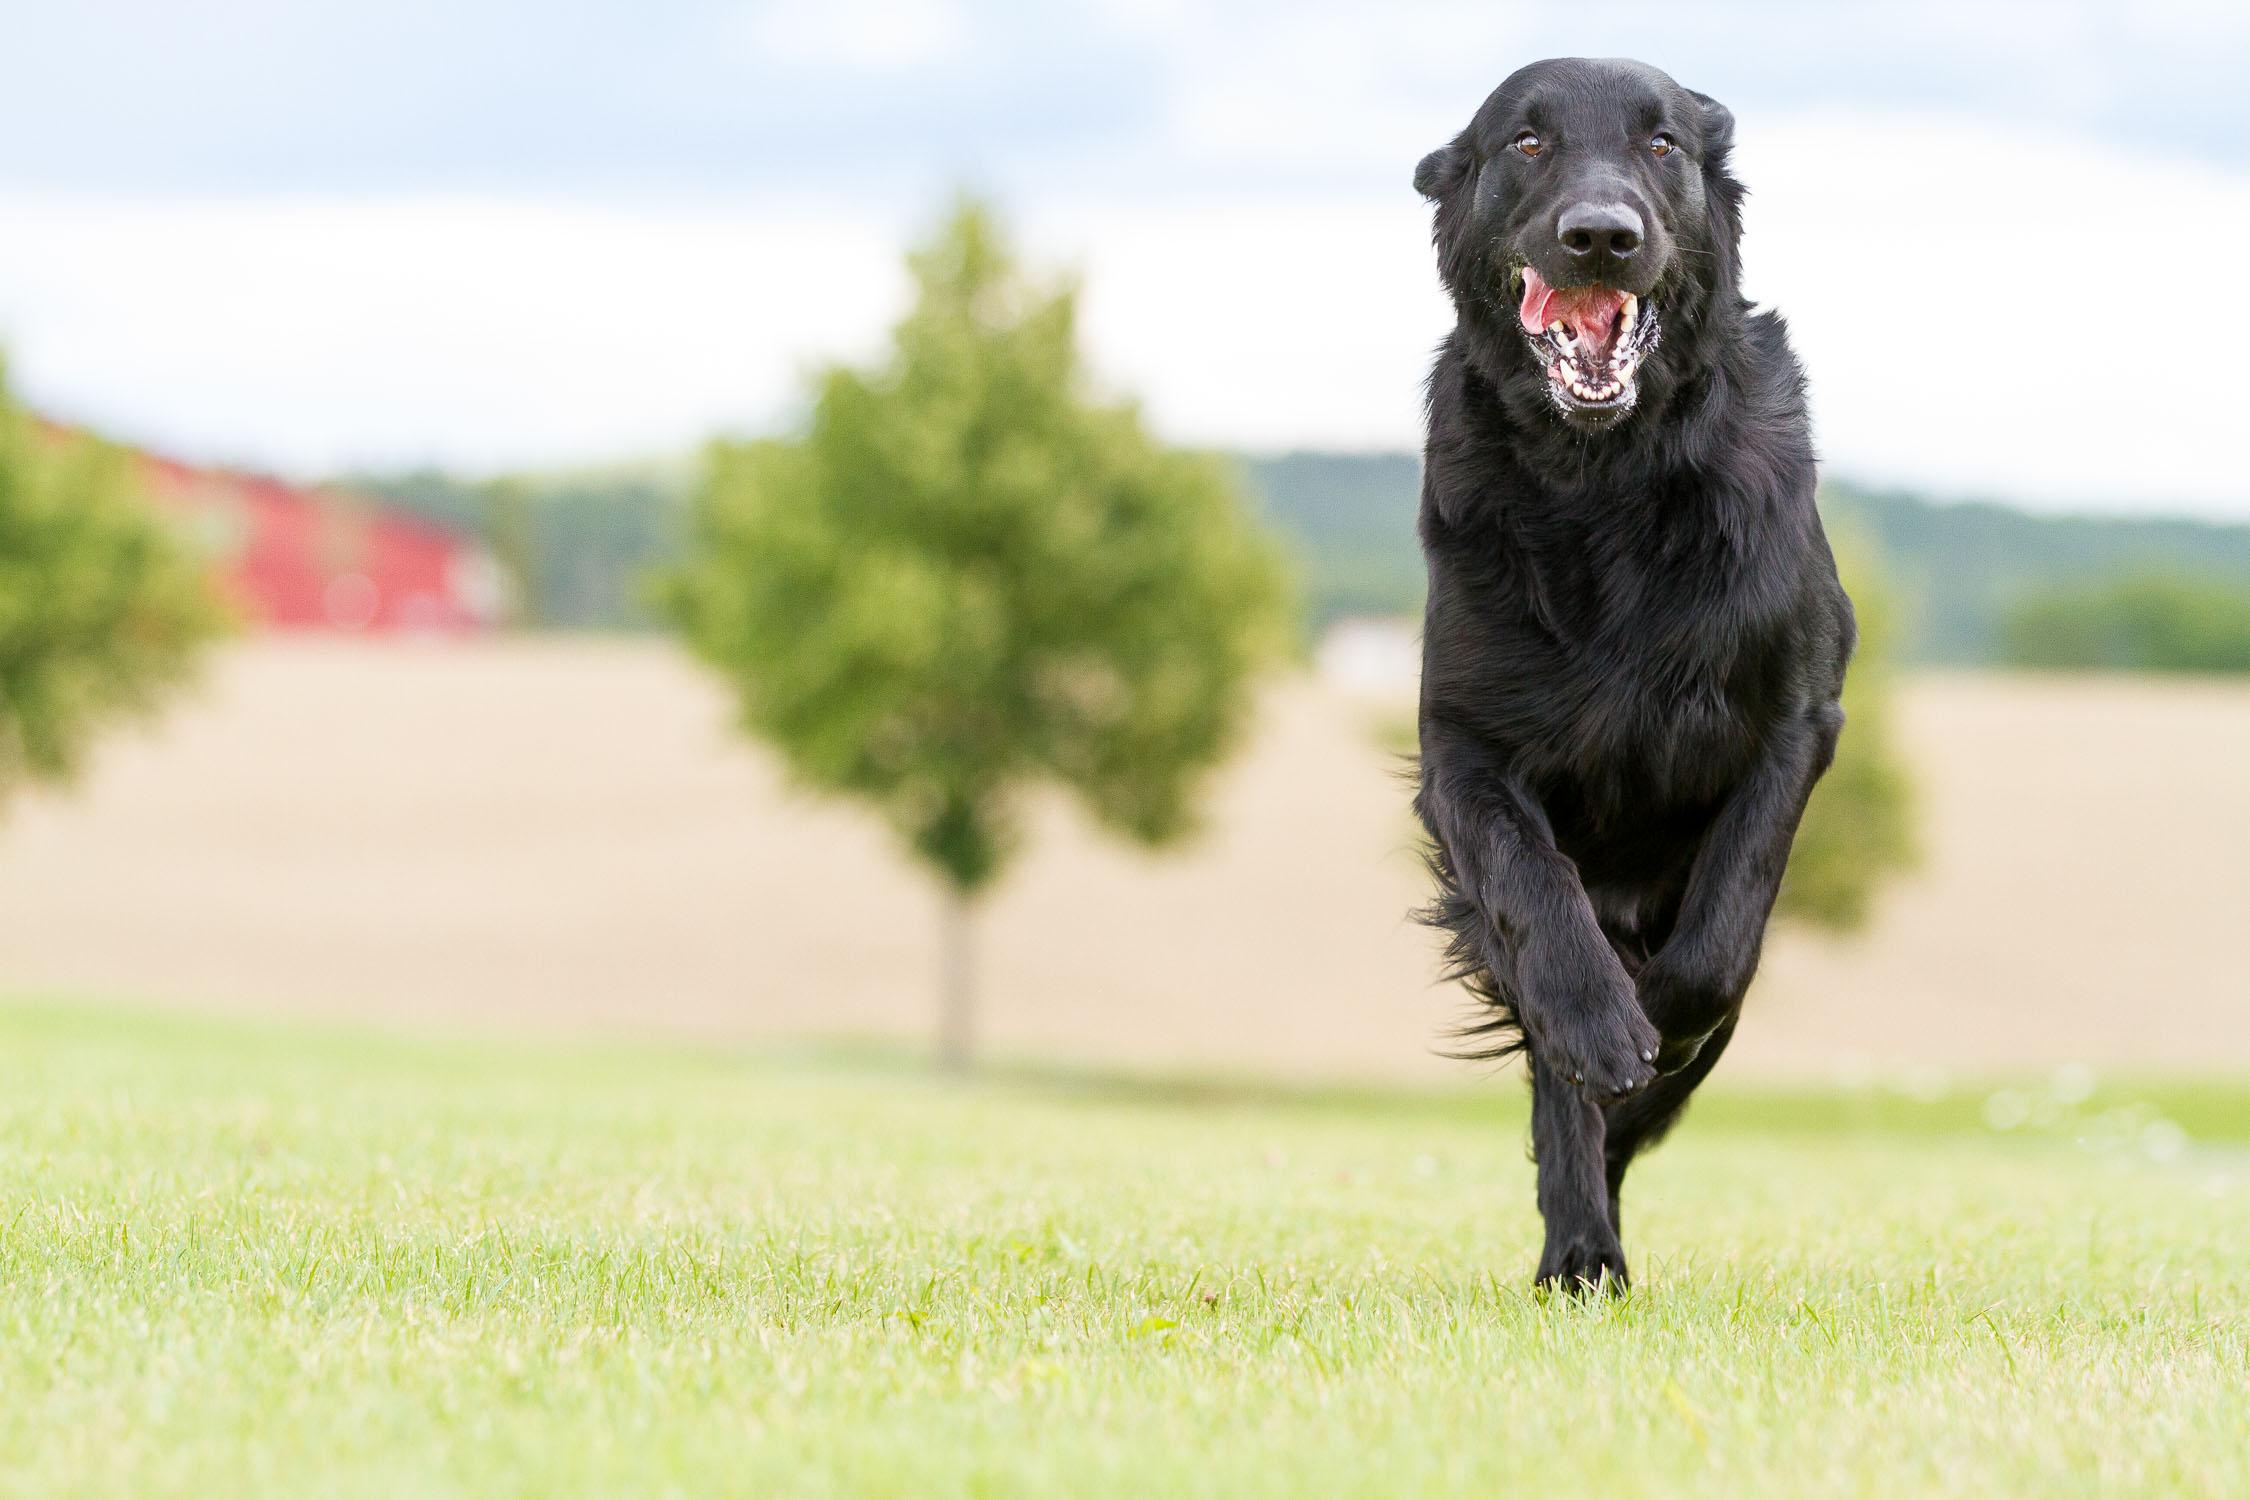 hundefotograf-hundefotografering-fotograf-sarpsborg-6